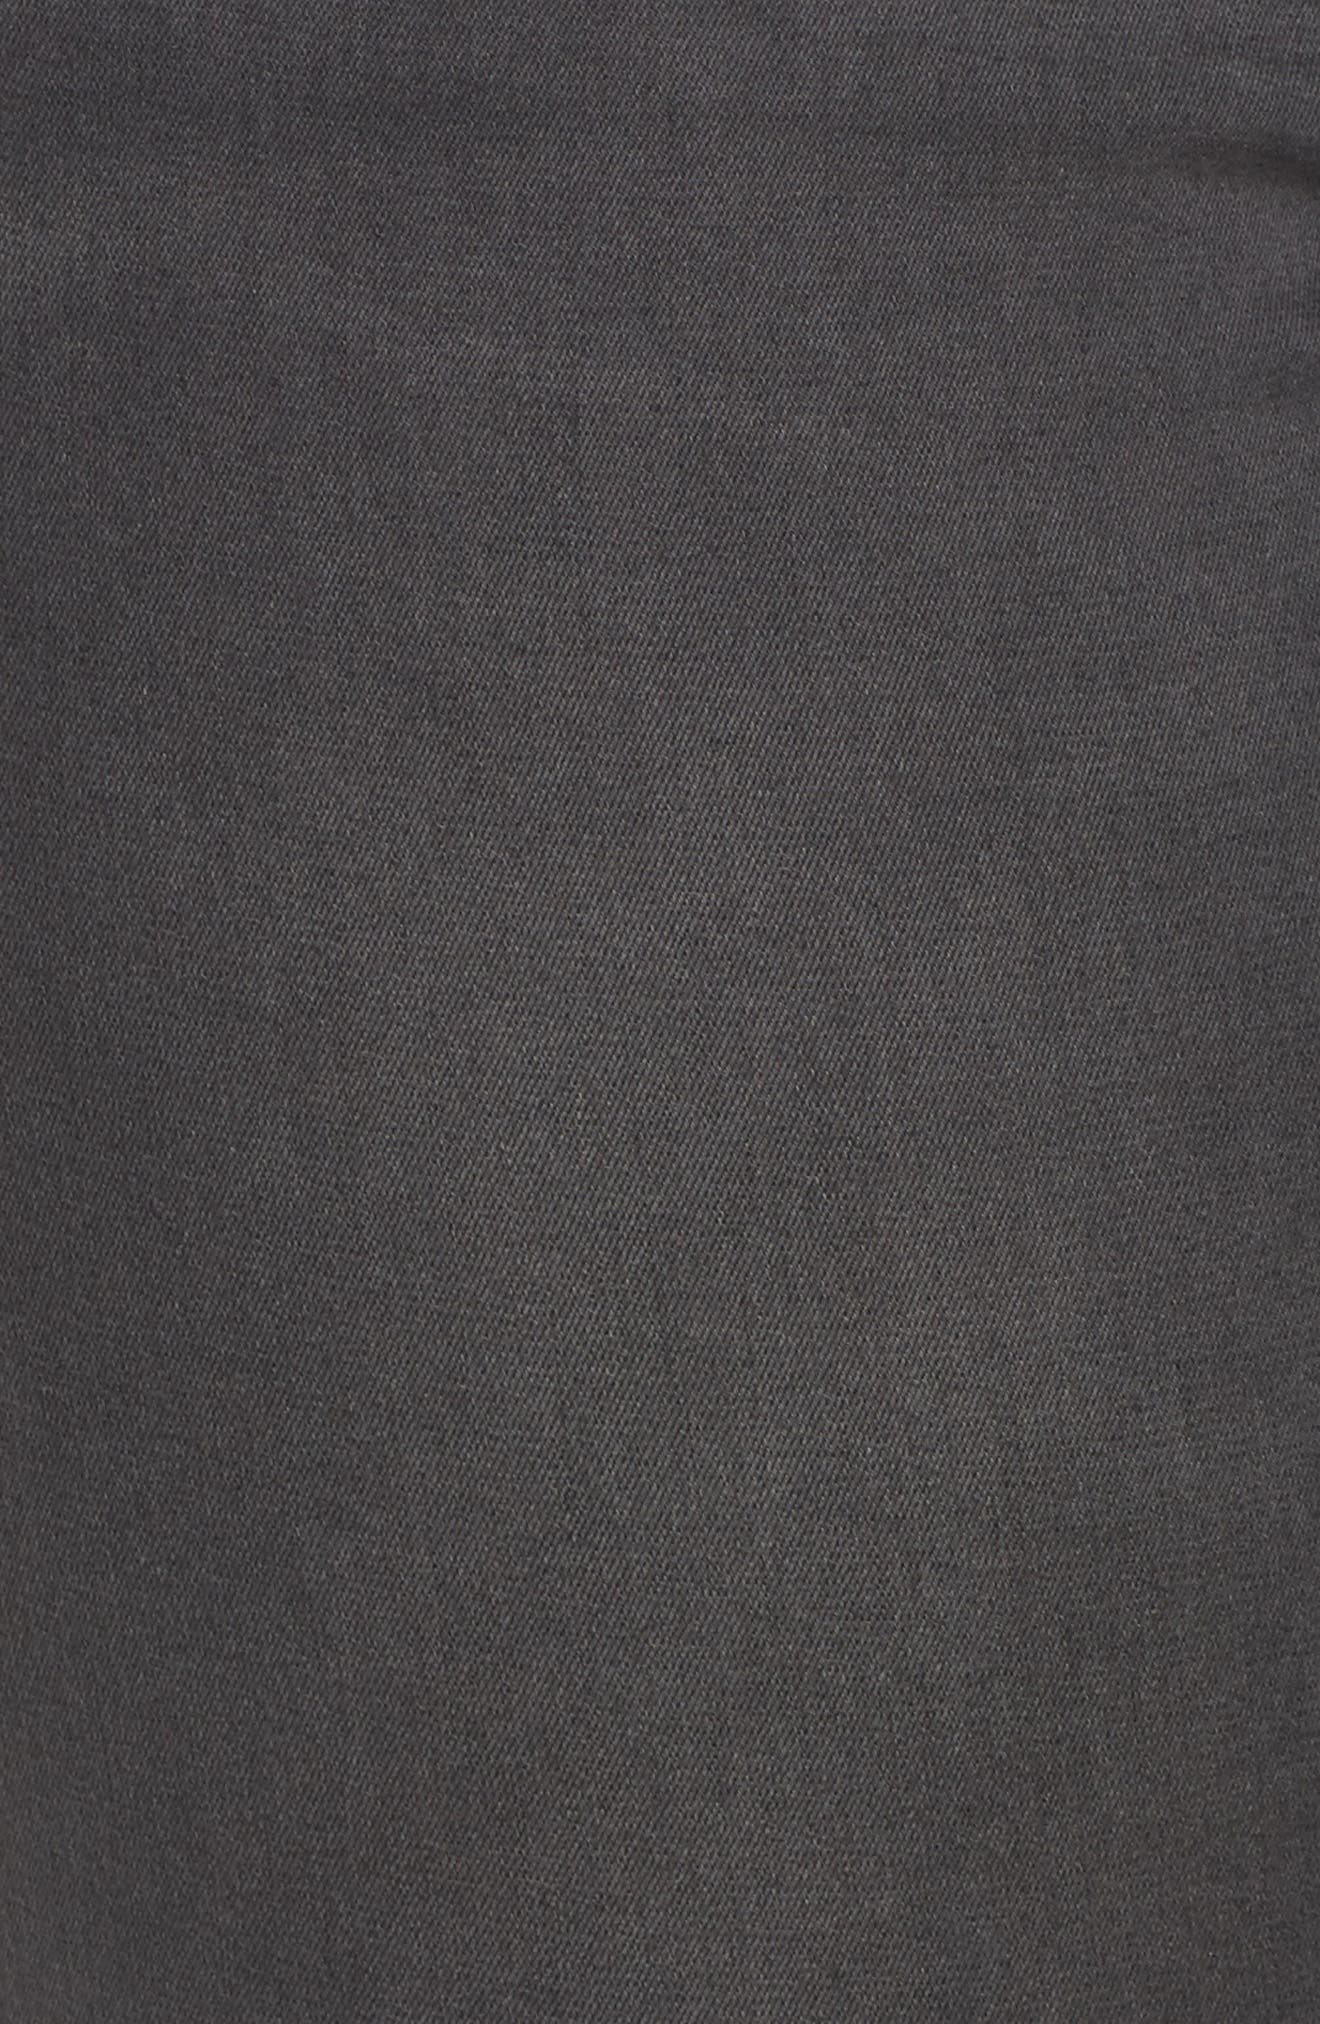 Ab-solution Ankle Skimmer Jeans,                             Alternate thumbnail 5, color,                             020